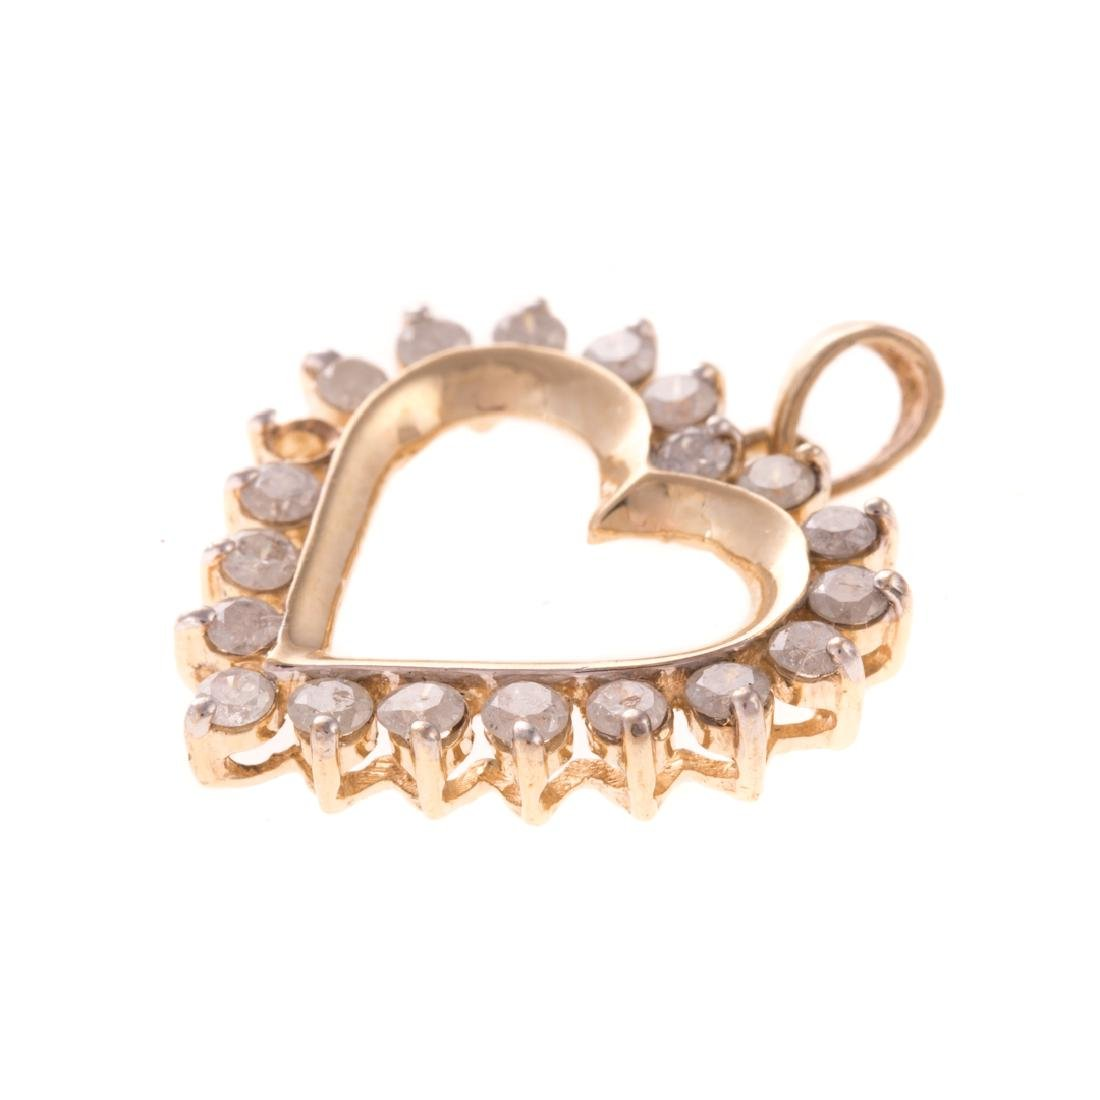 A Trio of Lady's Diamond & Gemstone Heart Pendants - 4